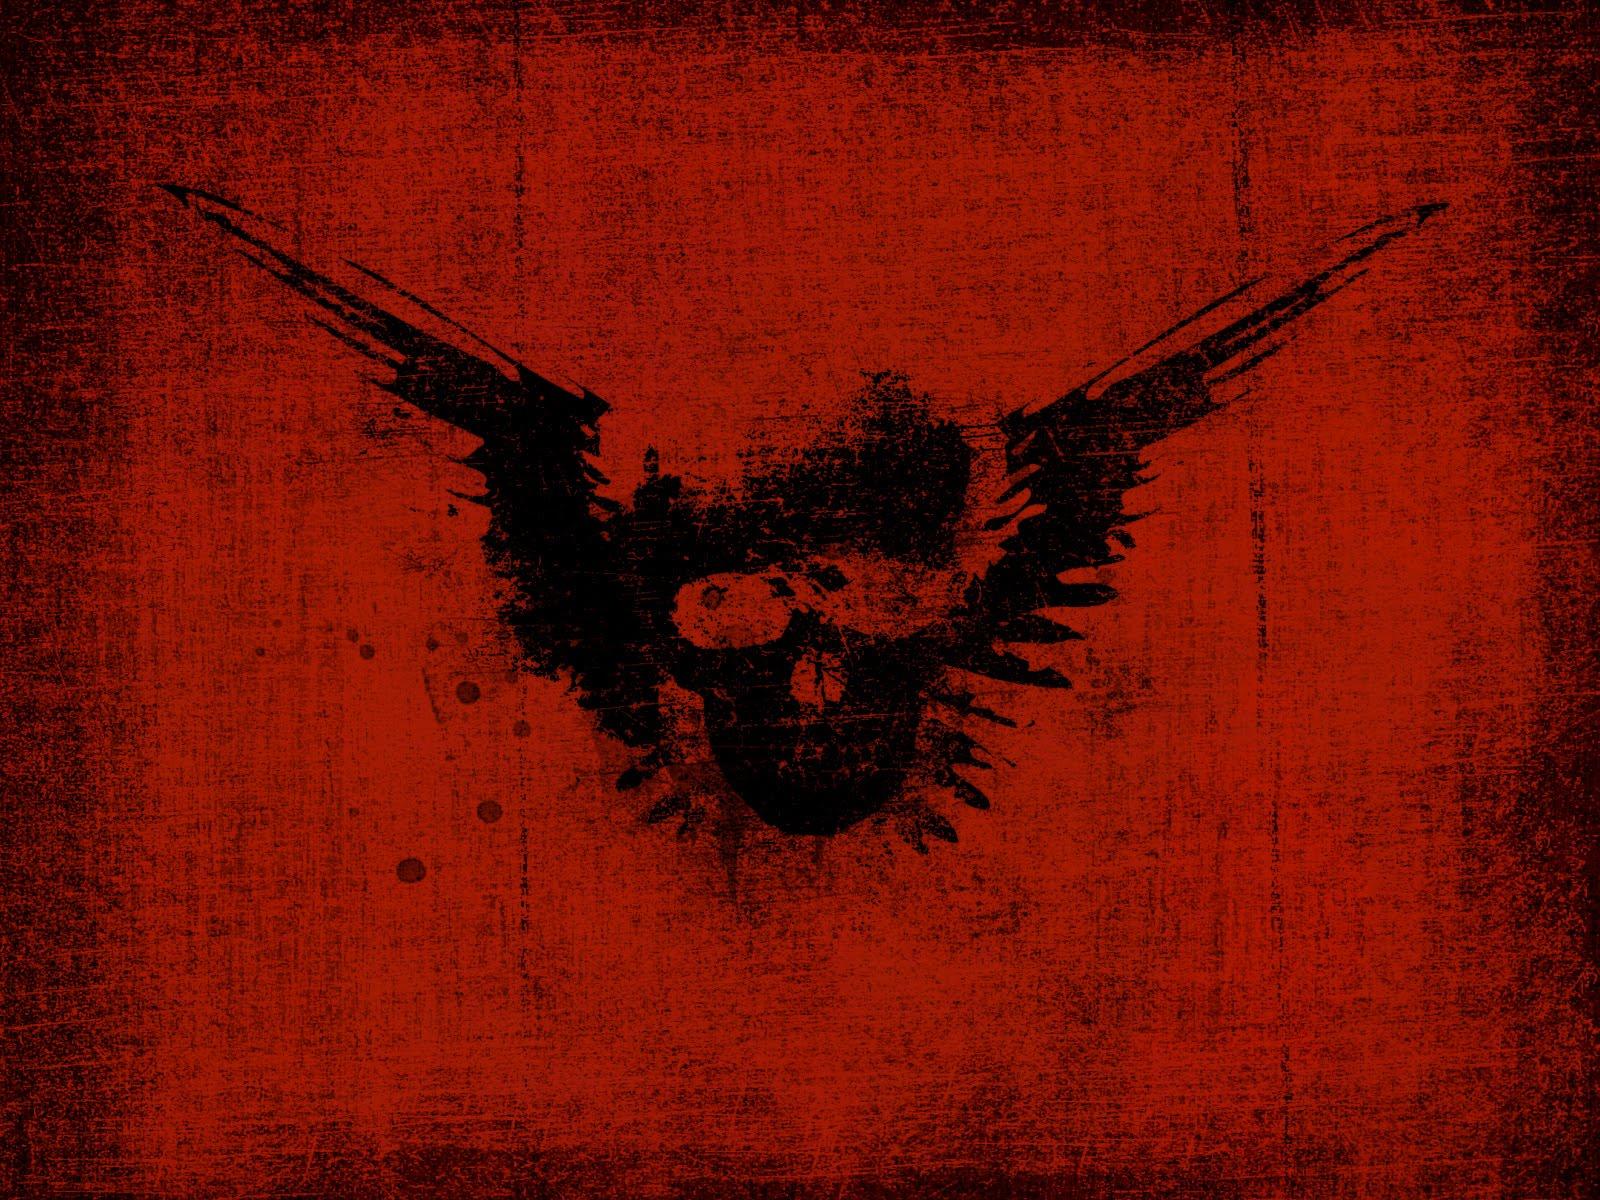 Black 21 Red Skull Wallpaper